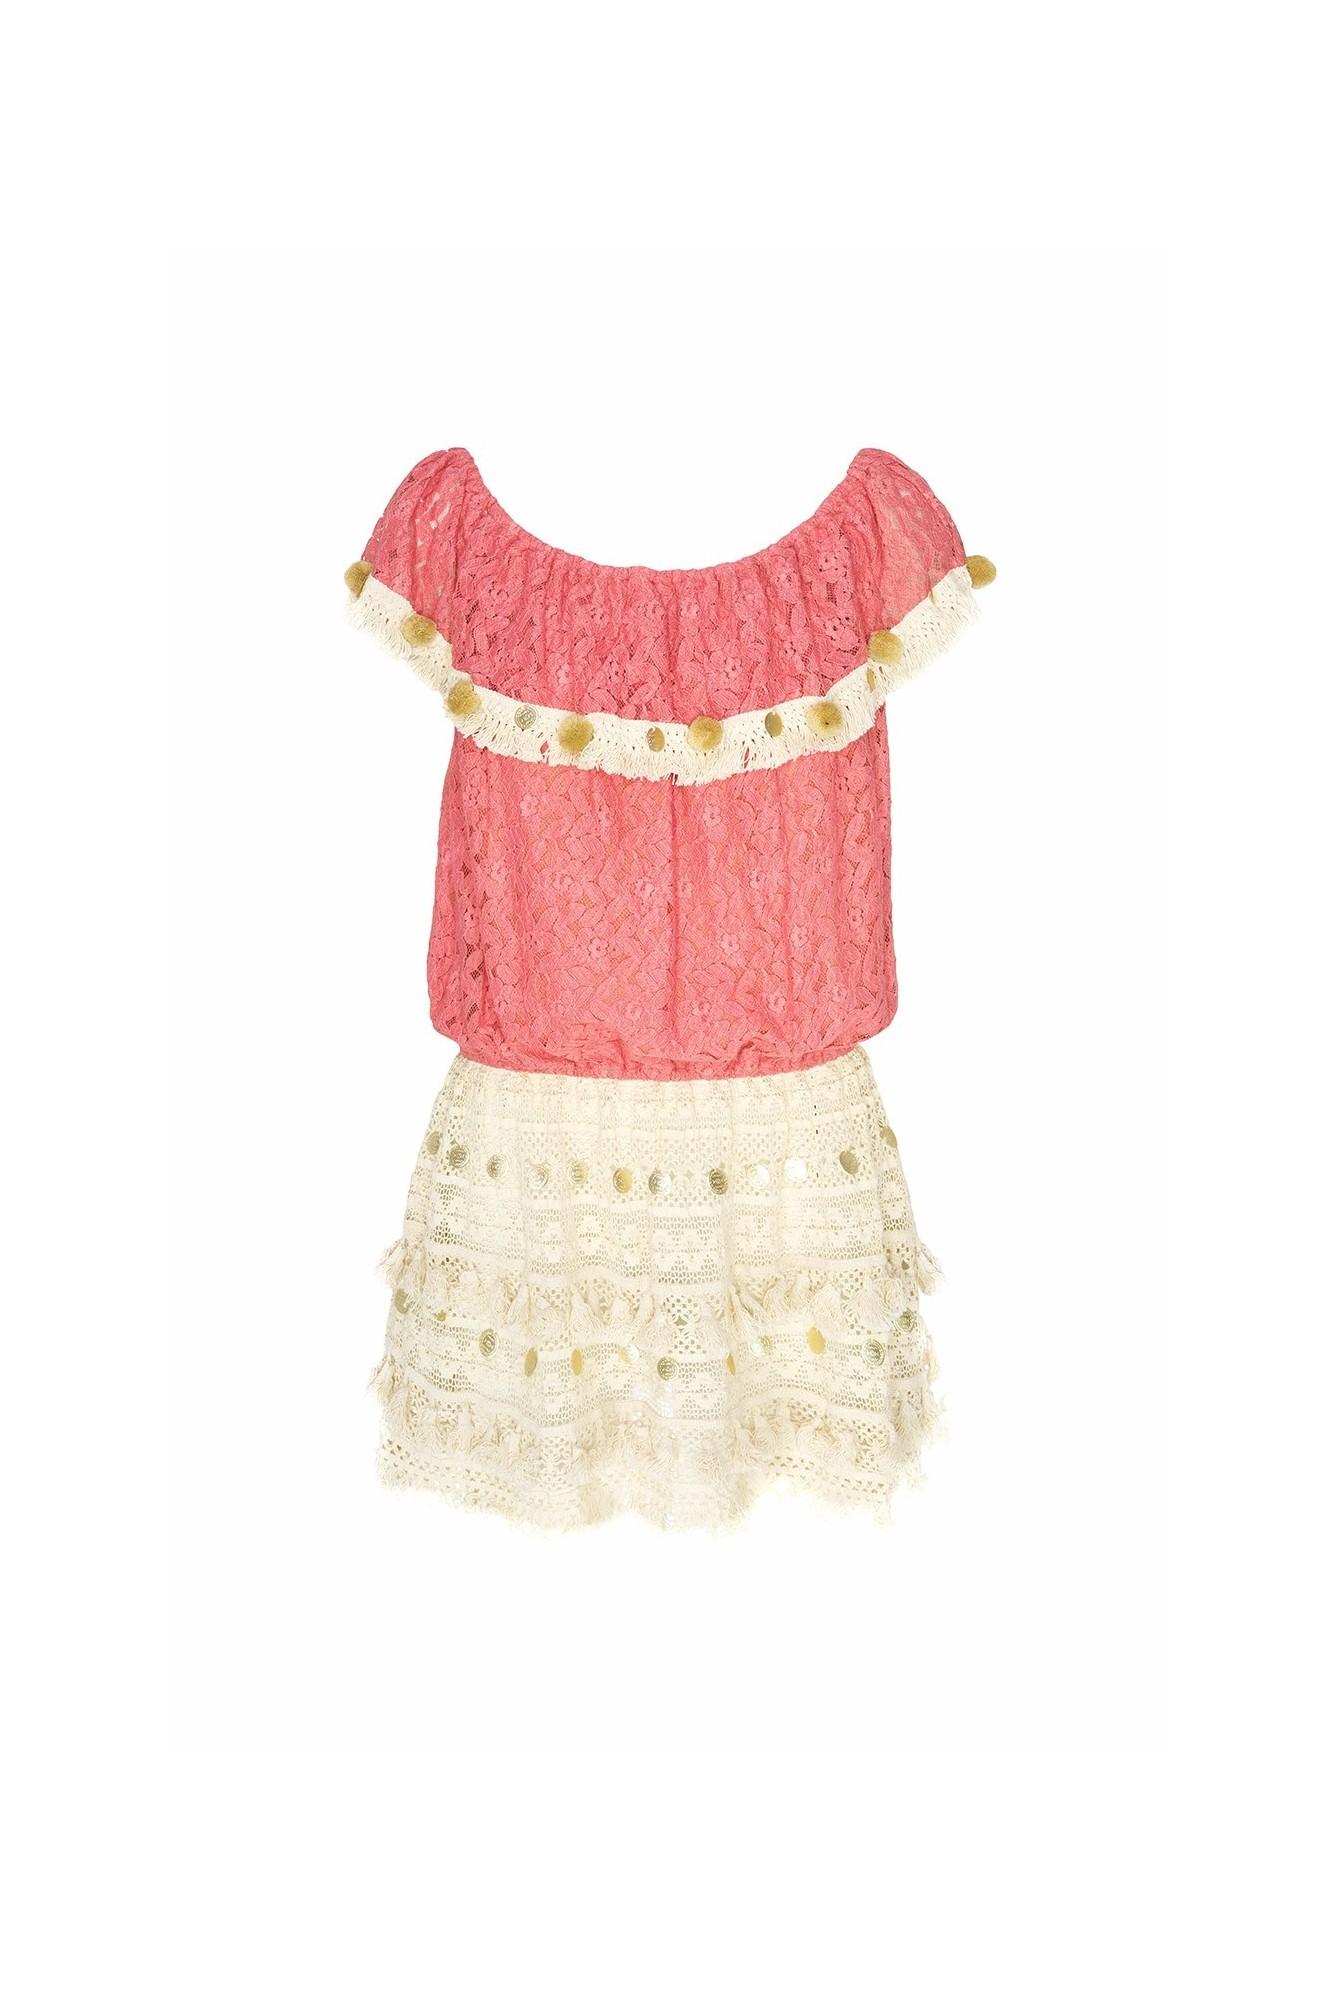 SISTER PREMILIA DRESS